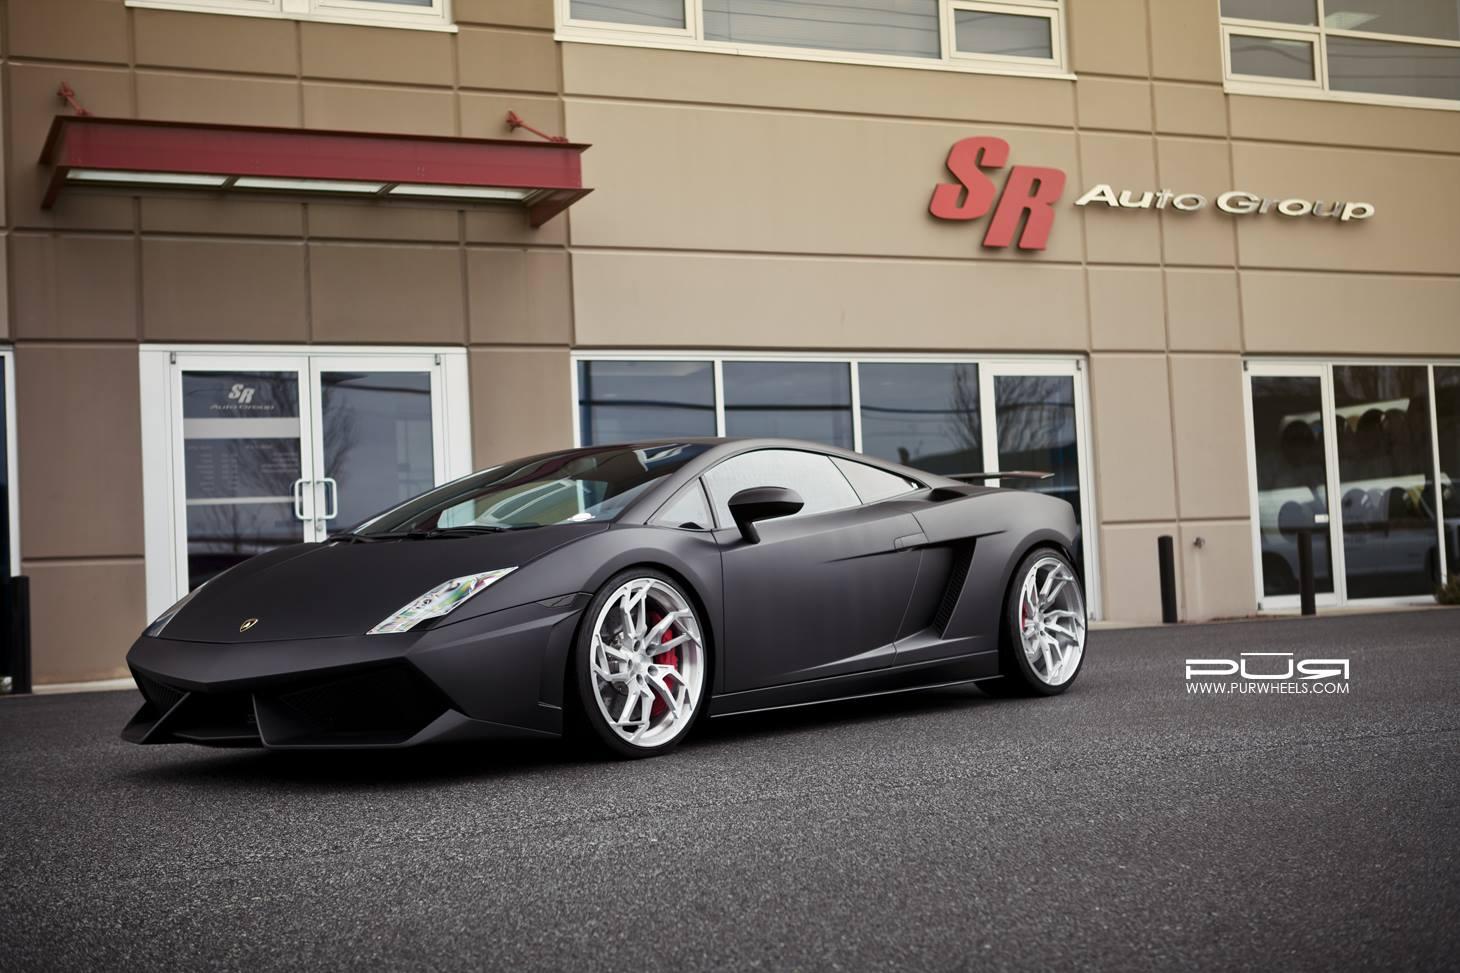 Matte Black Lamborghini Gallardo Lp560 4 On Egoista Inspired Pur